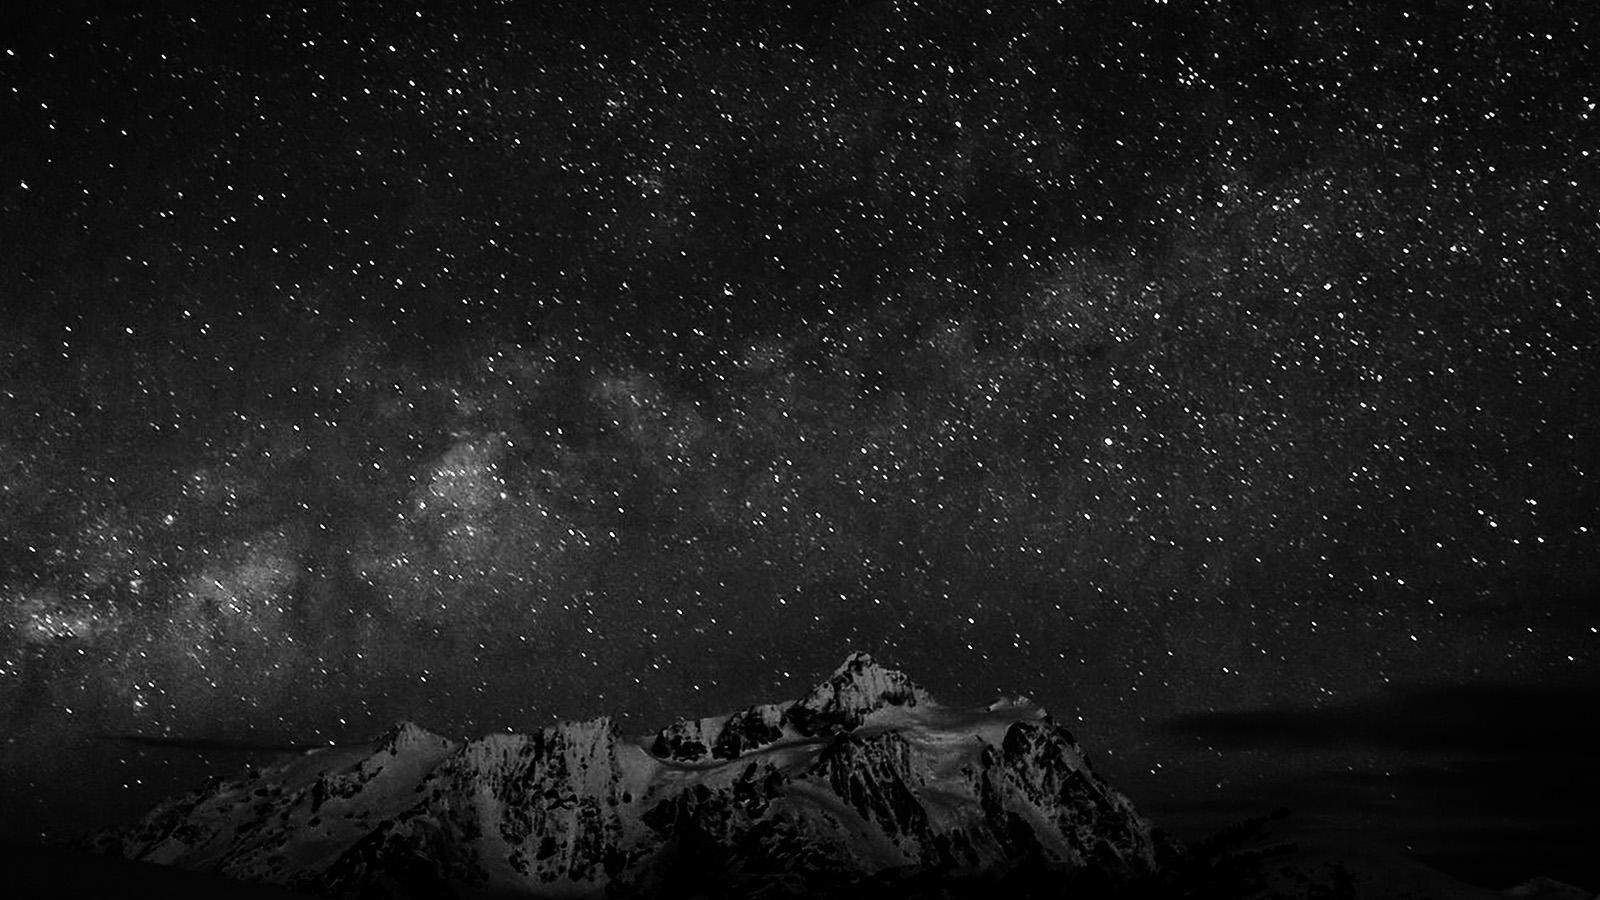 Nf Wallpaper Quotes Wallpaper For Desktop Laptop Nf71 Starry Night Sky